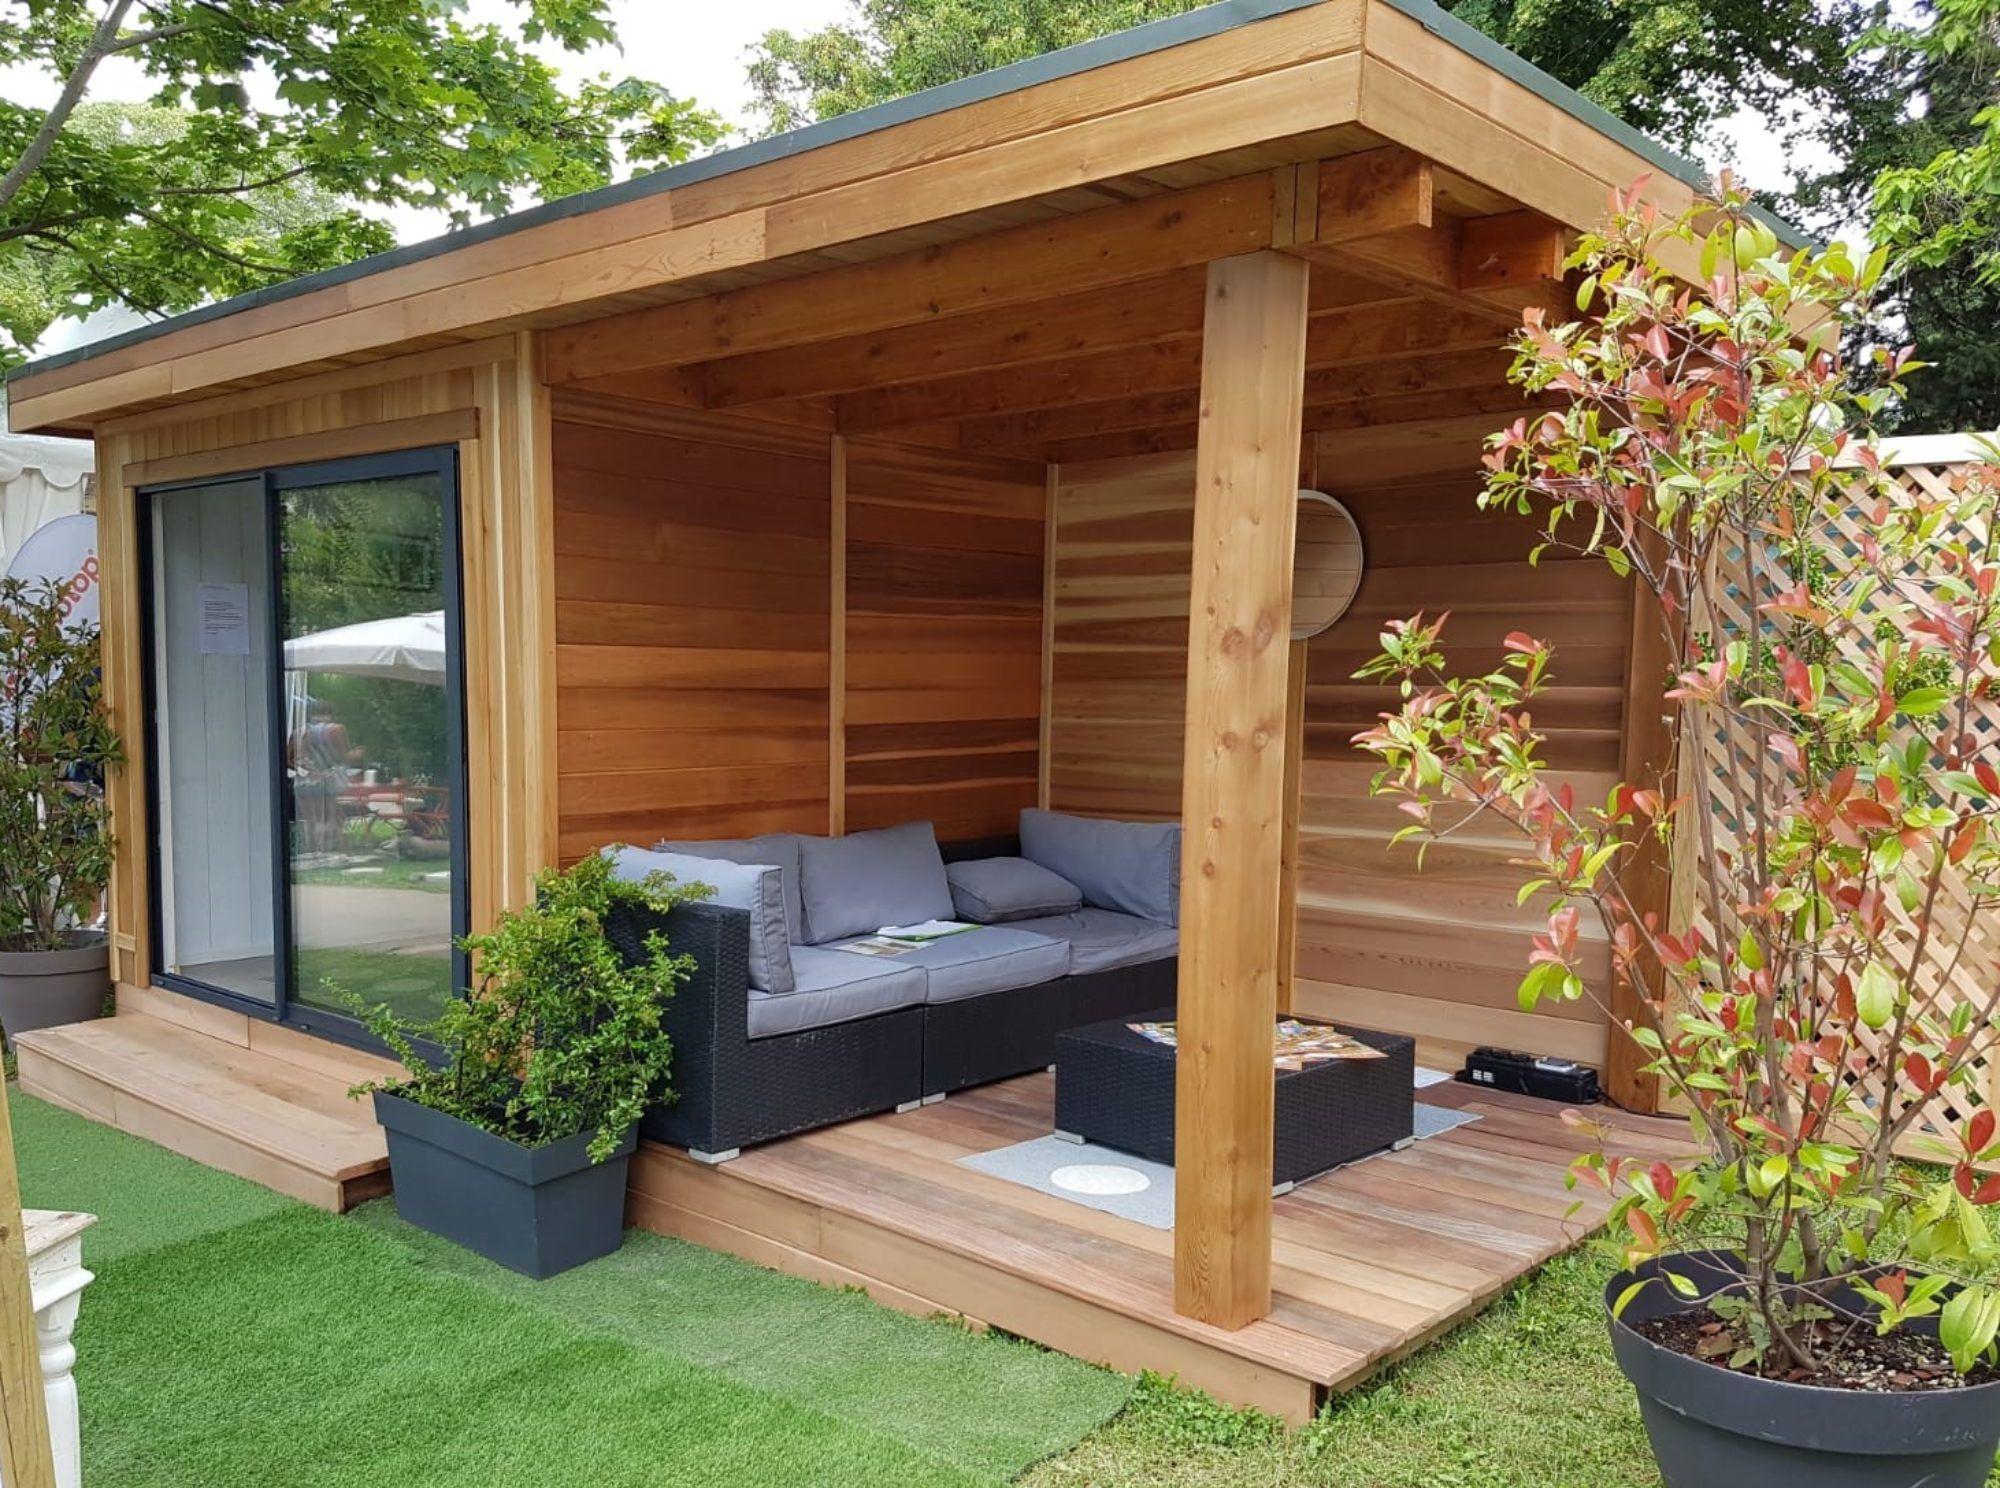 Espace Habitable, Studio De Jardin, Extension, Bureau De ... encequiconcerne Studio Jardin Habitable